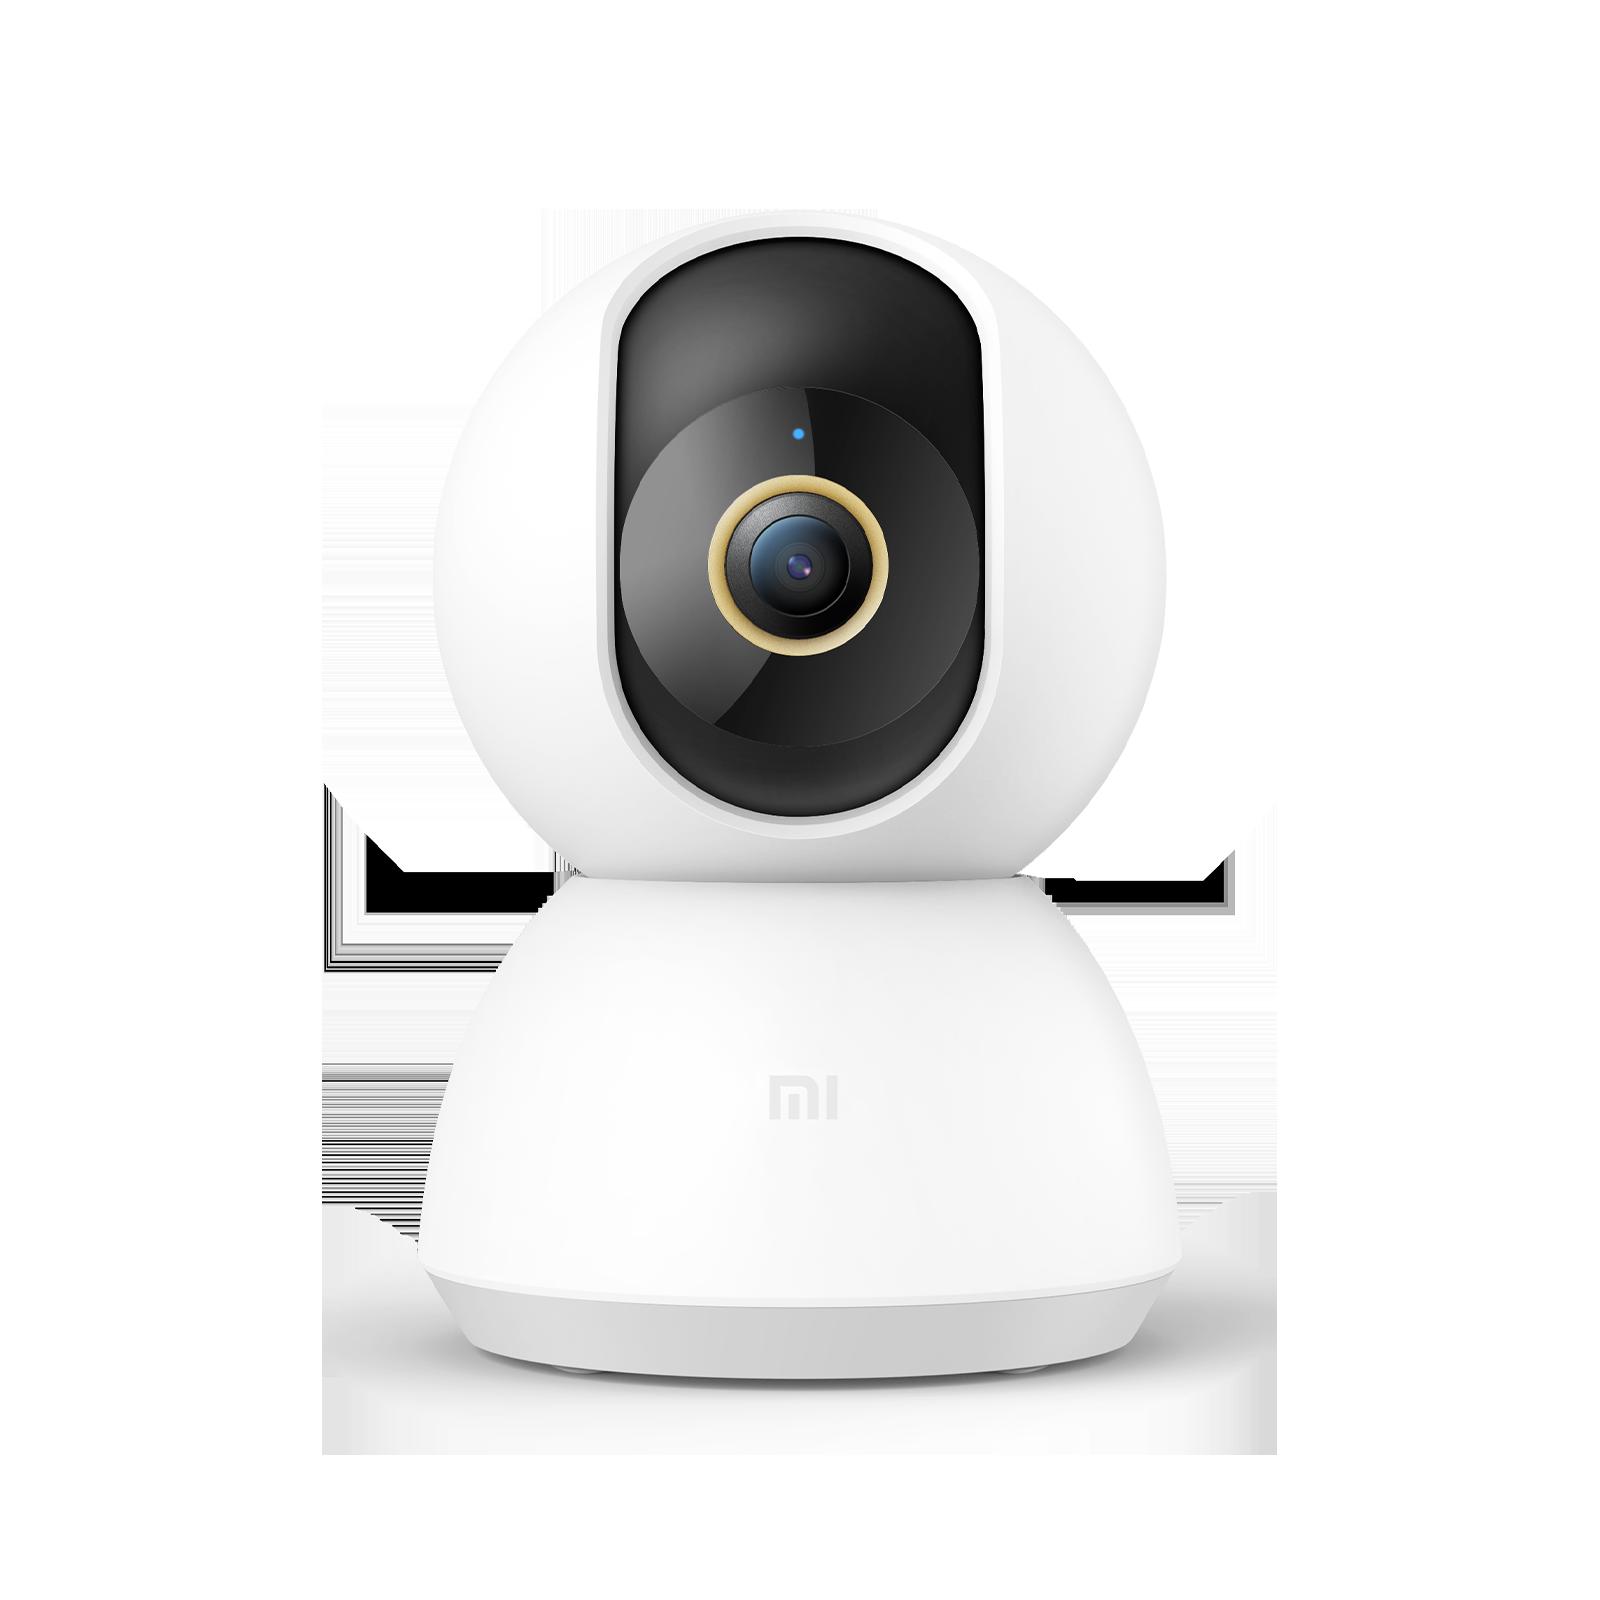 Mi 360° Home Security Camera 2K.